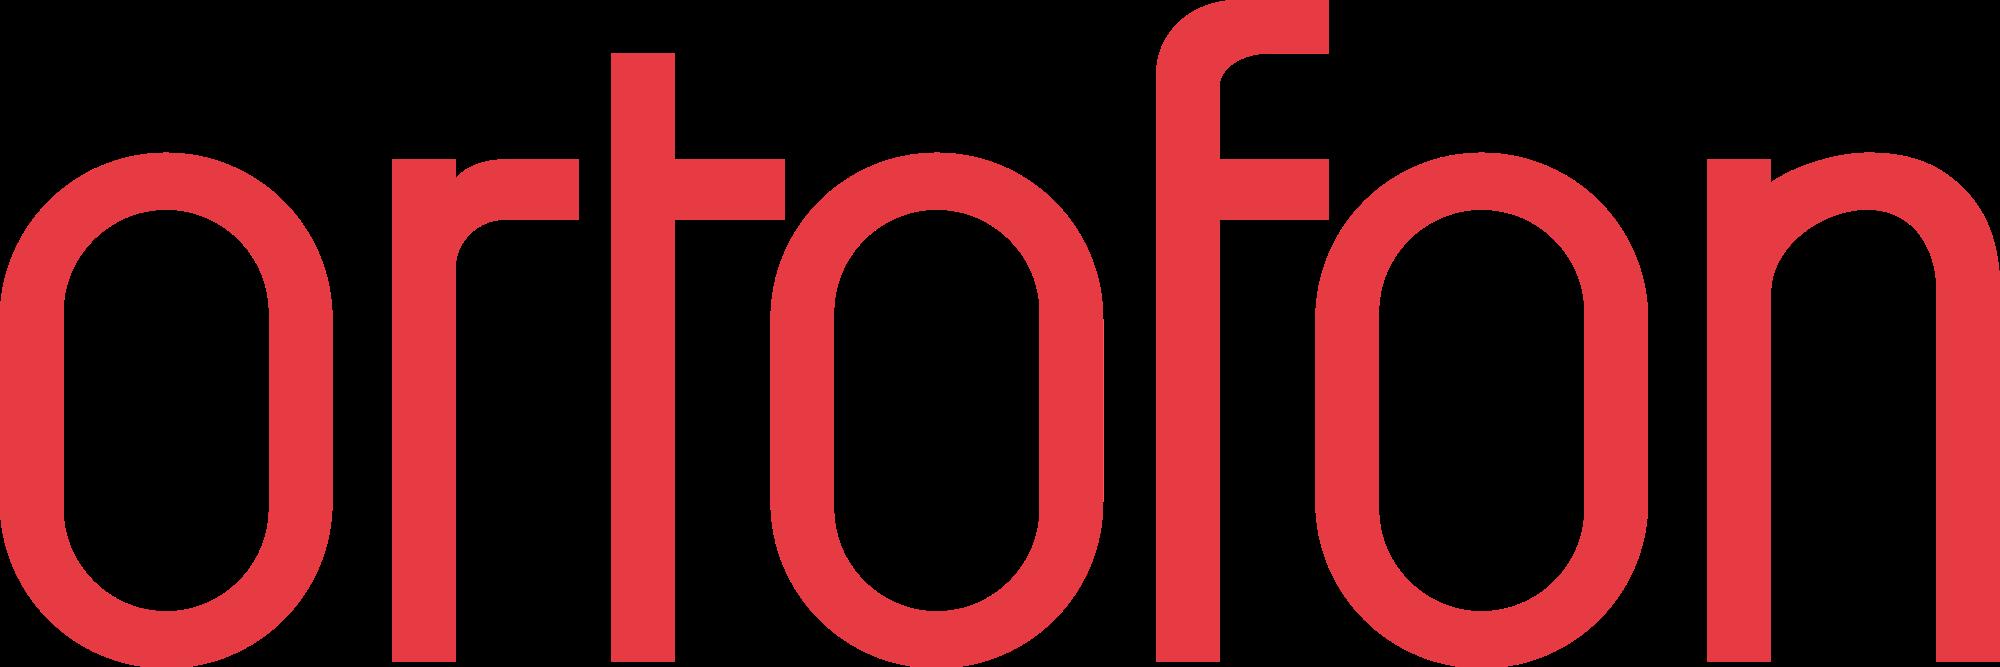 Logo ortofon red